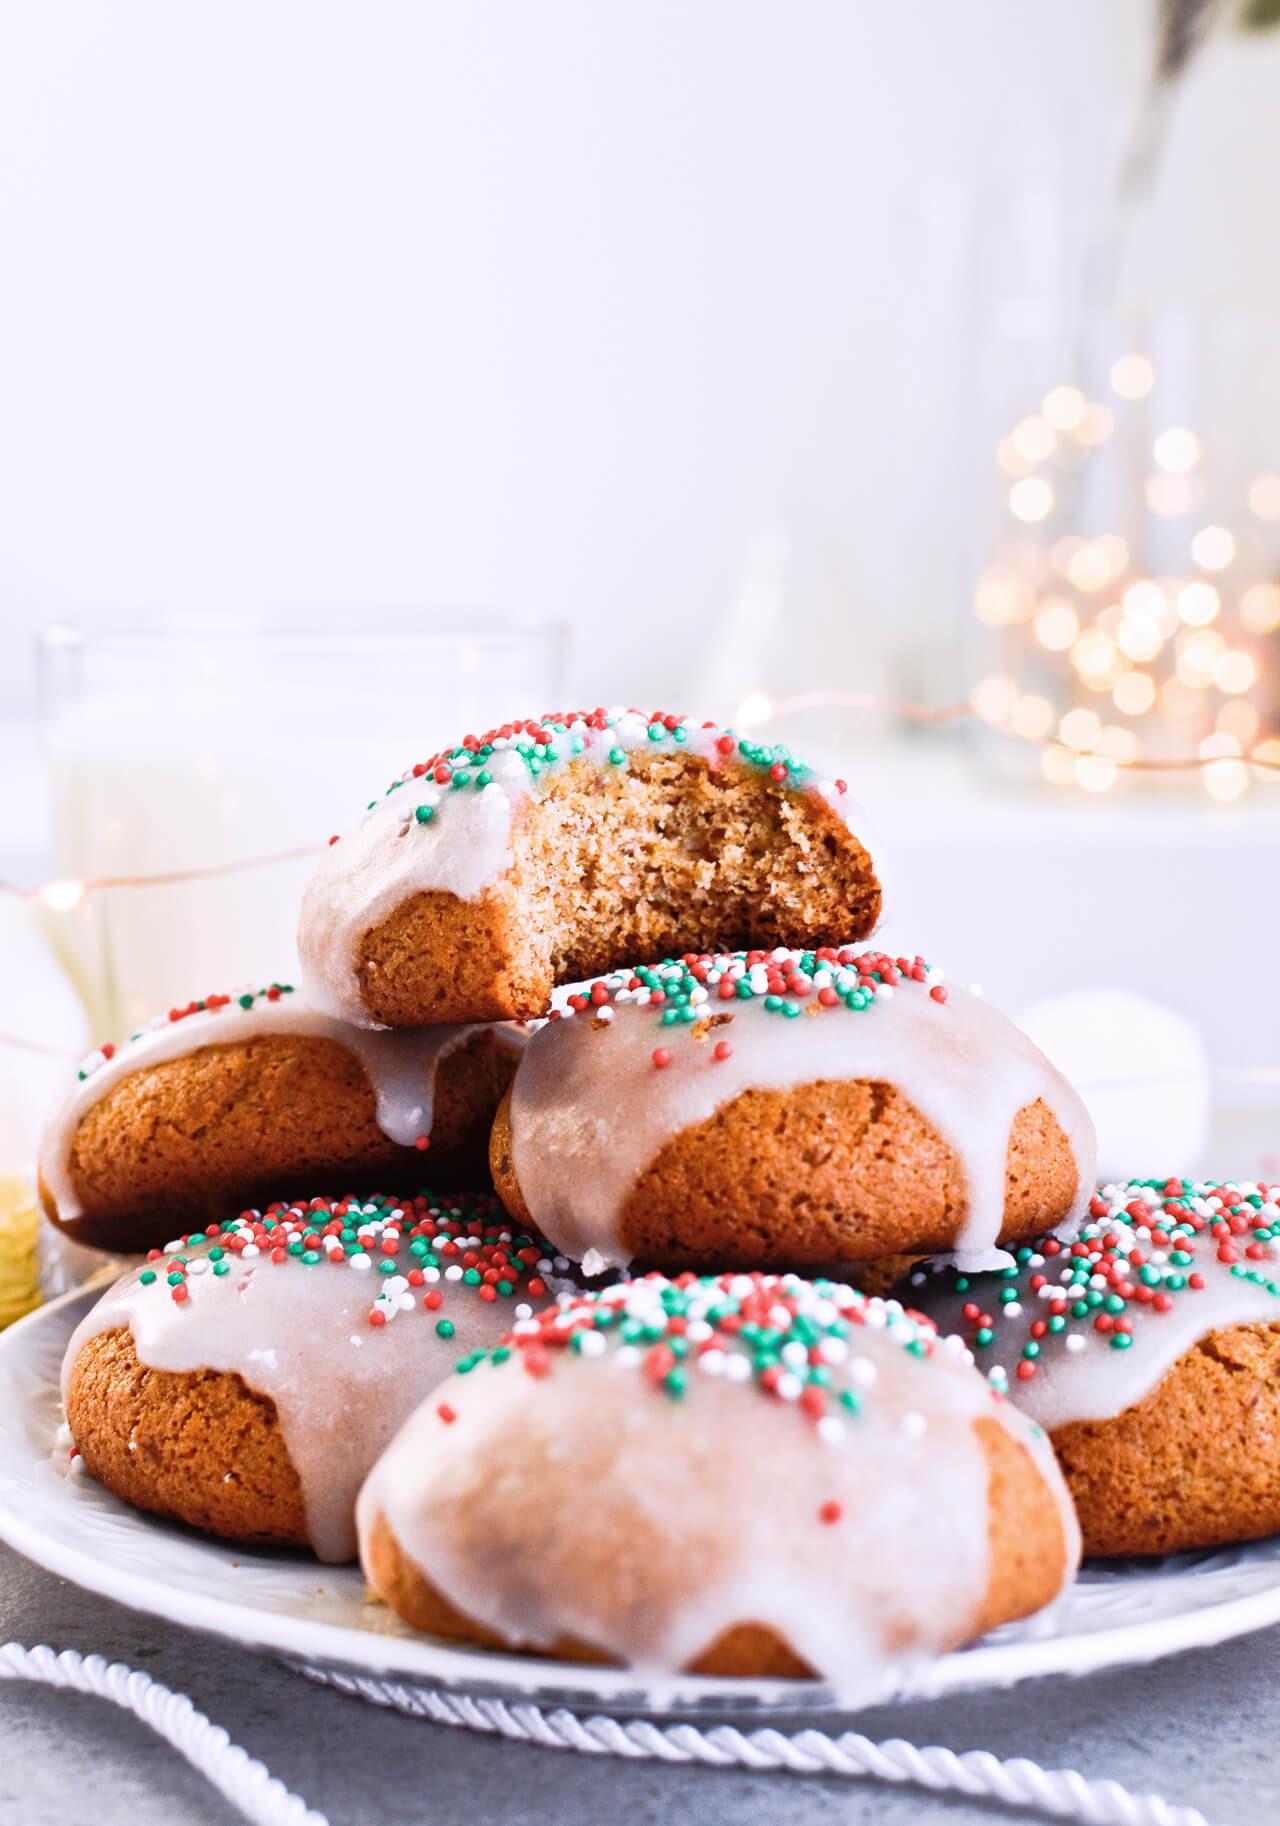 German Christmas Cookies Lebkuchen  Sugar glazed lebkuchen German Christmas cookies Mitzy